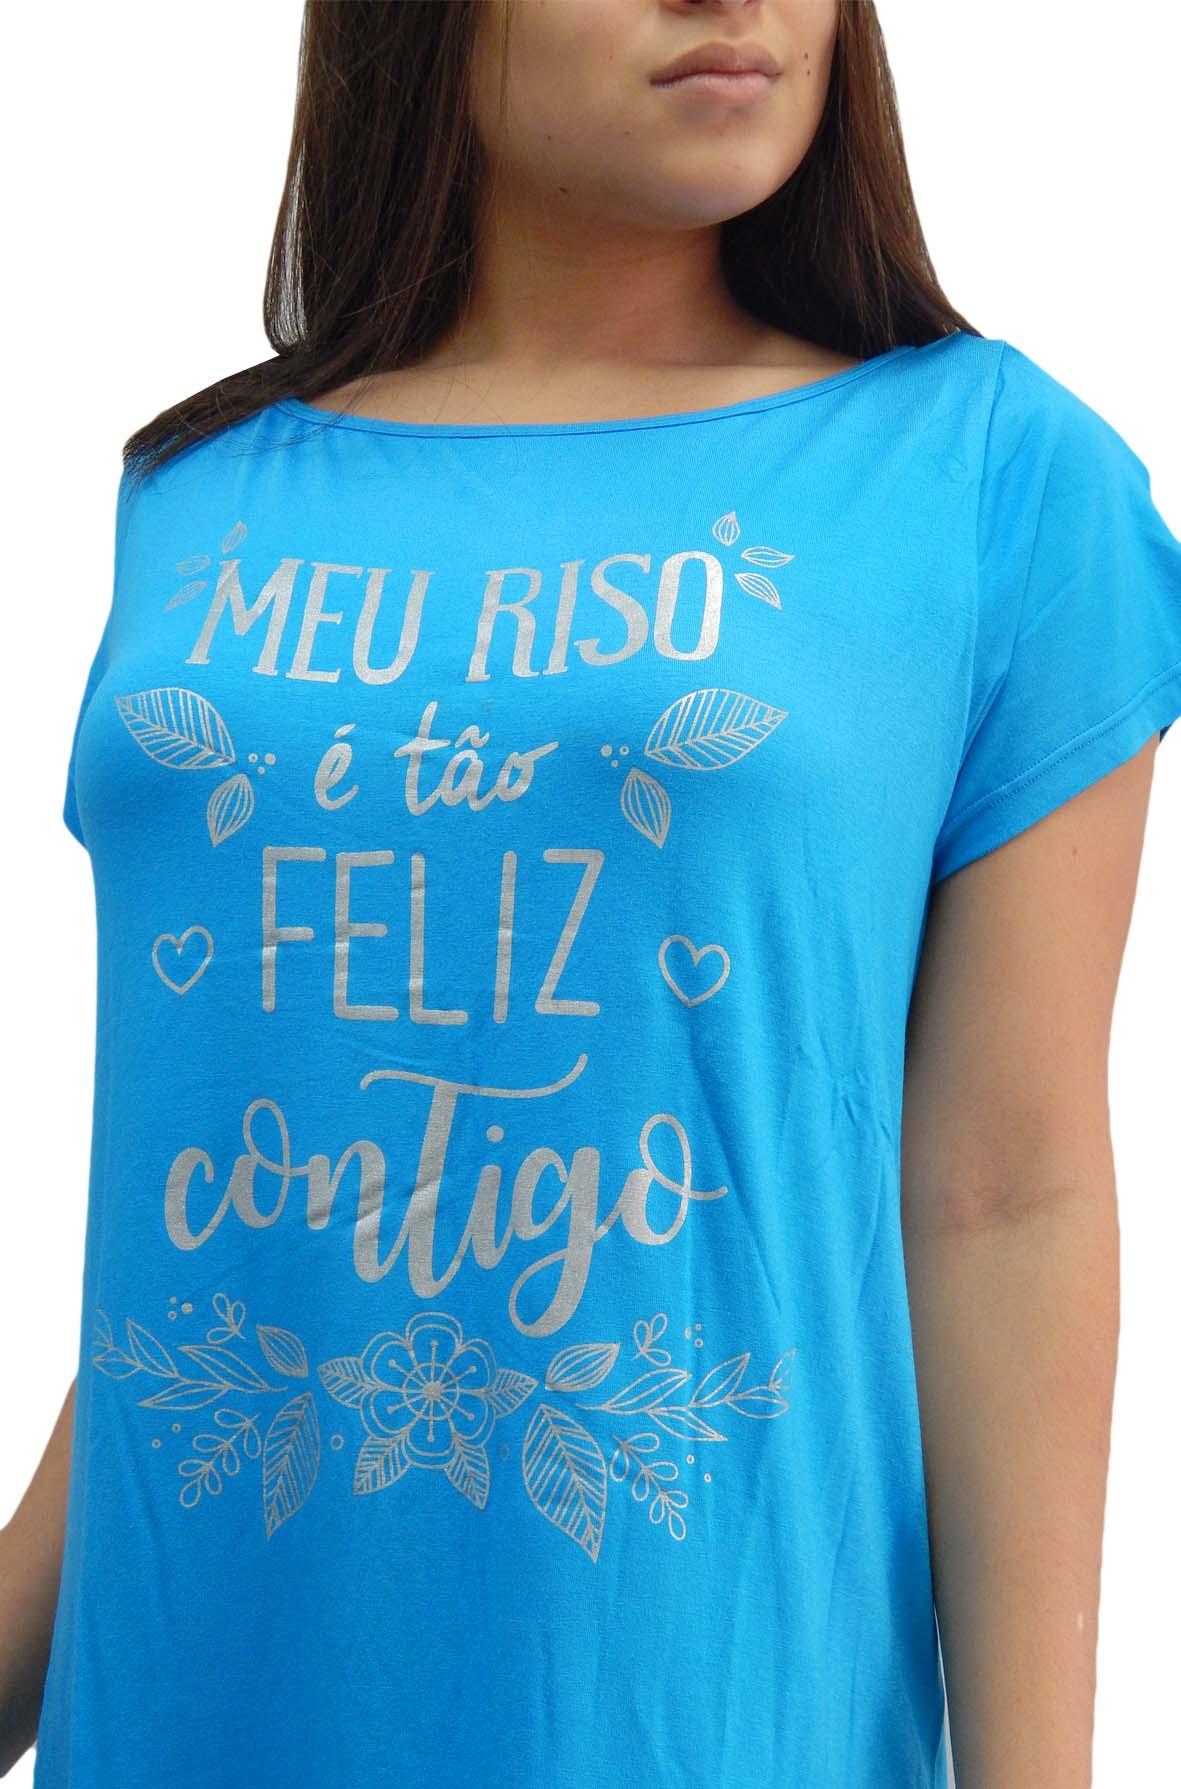 Camisola Estilo Camisetão Curto e Solto - Paulienne  JC614759